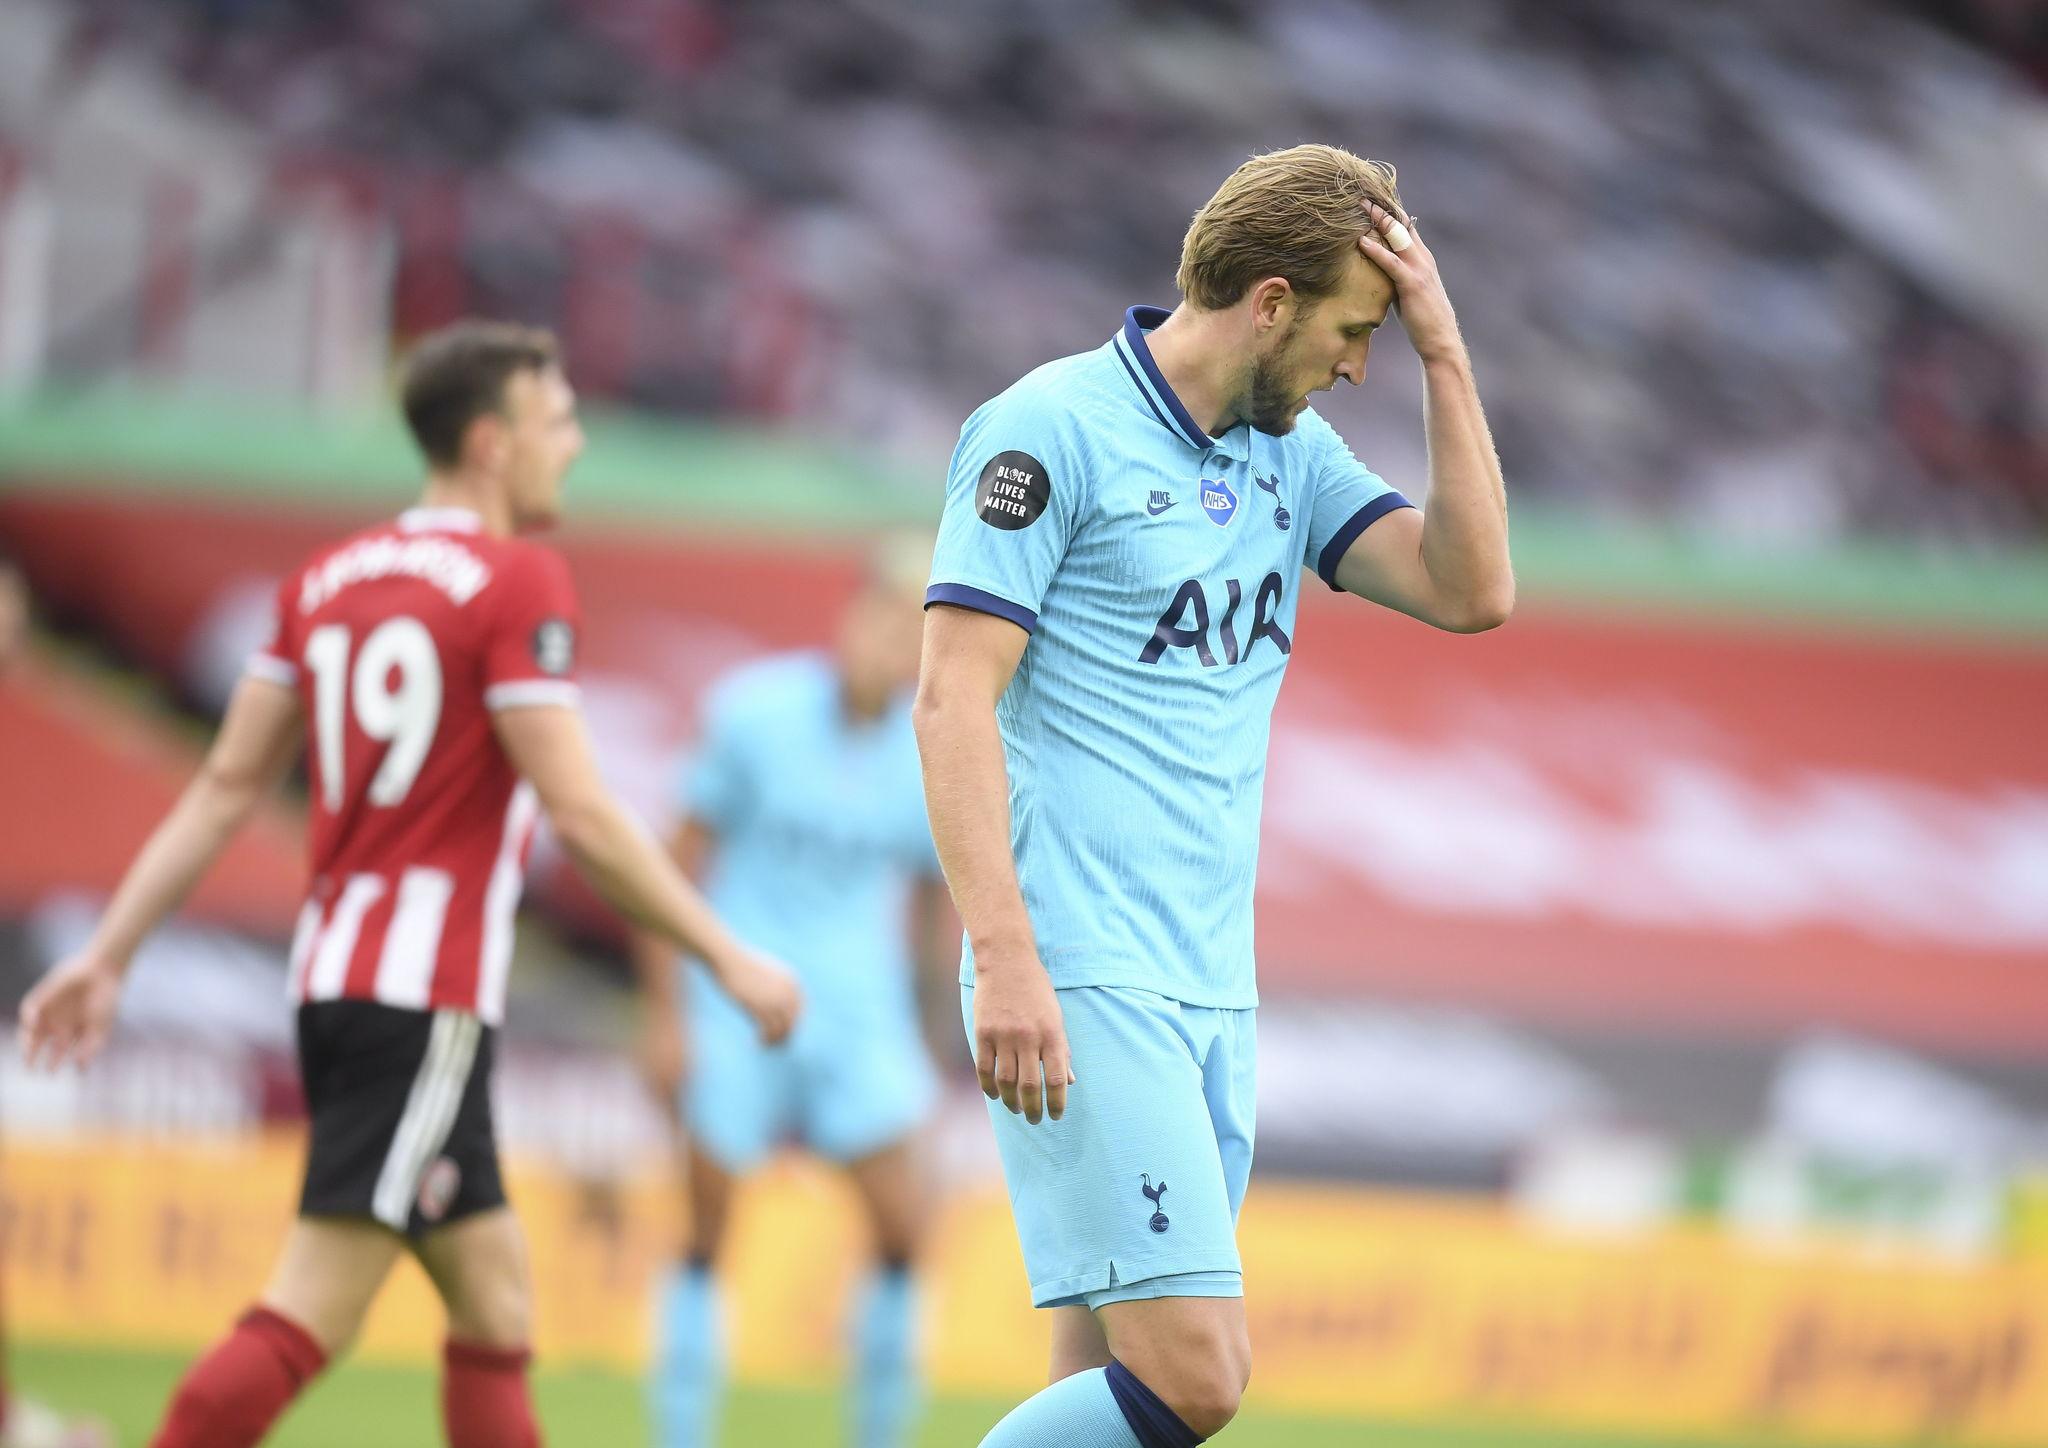 Sheffield Utd vs Tottenham El Tottenham se complica su presencia ...